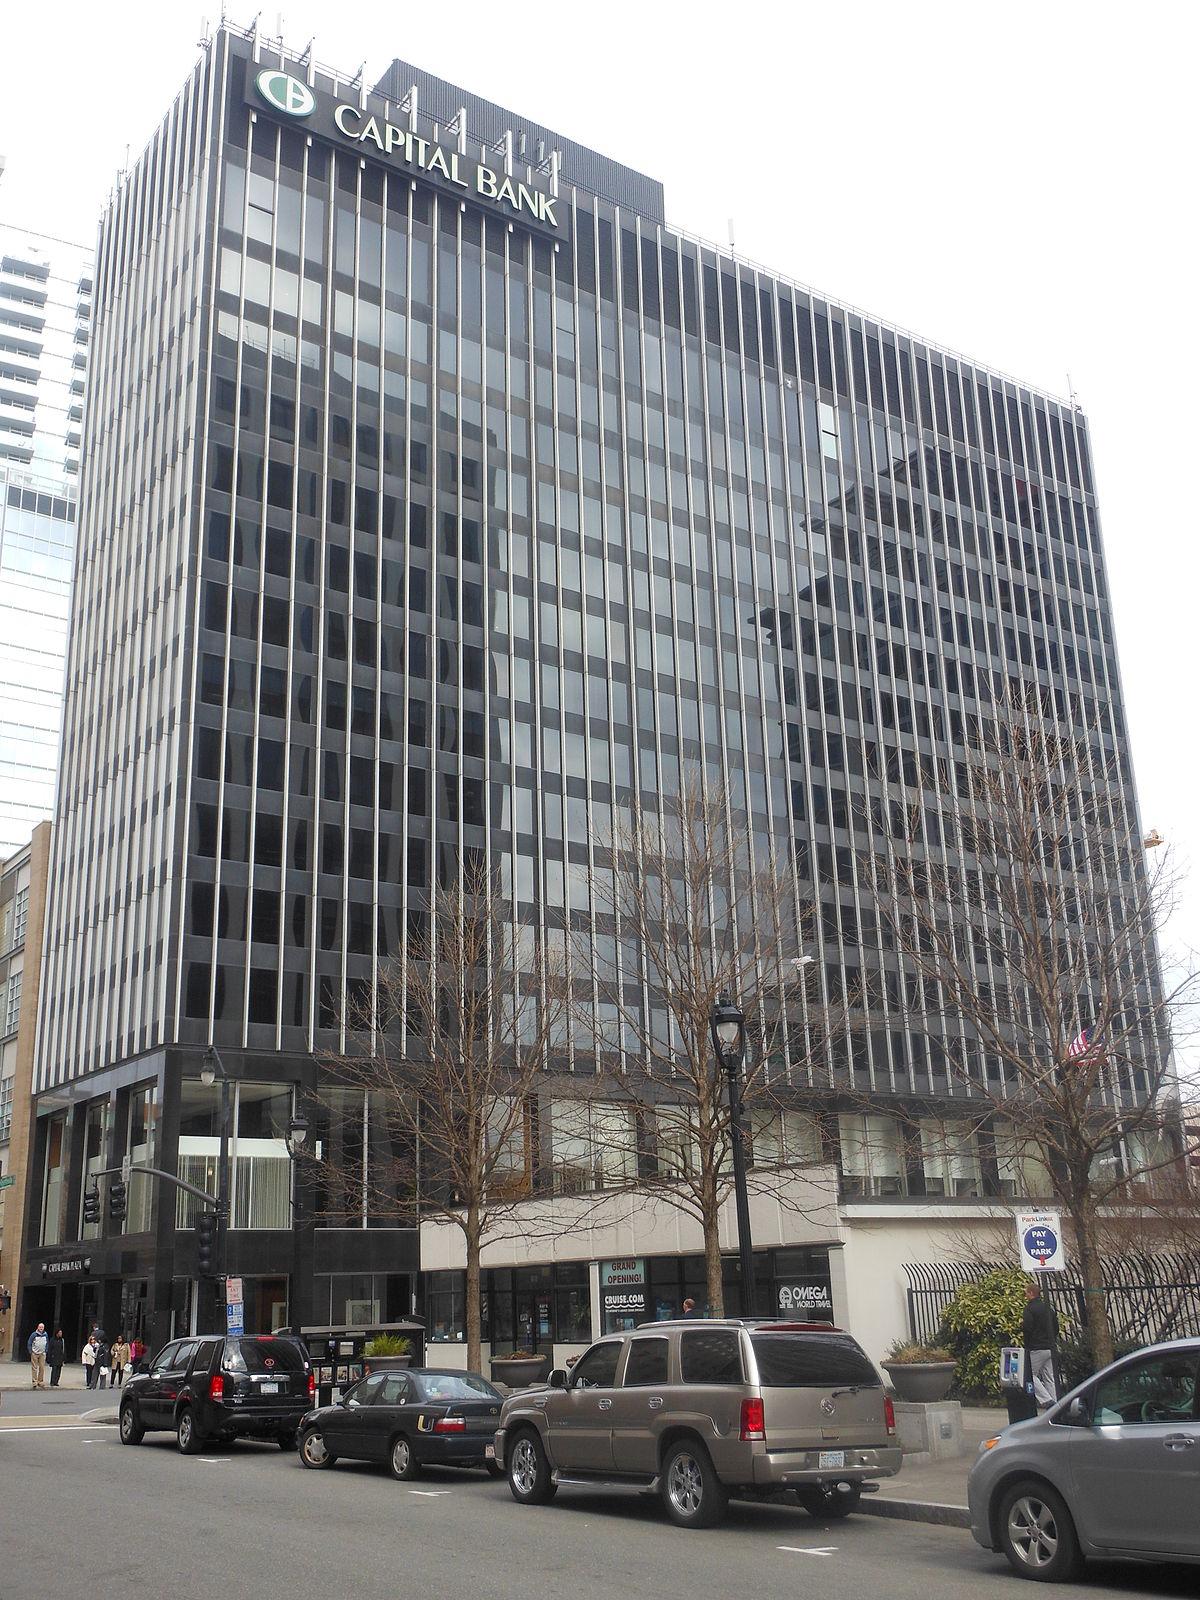 Capital Bank Plaza Wikipedia